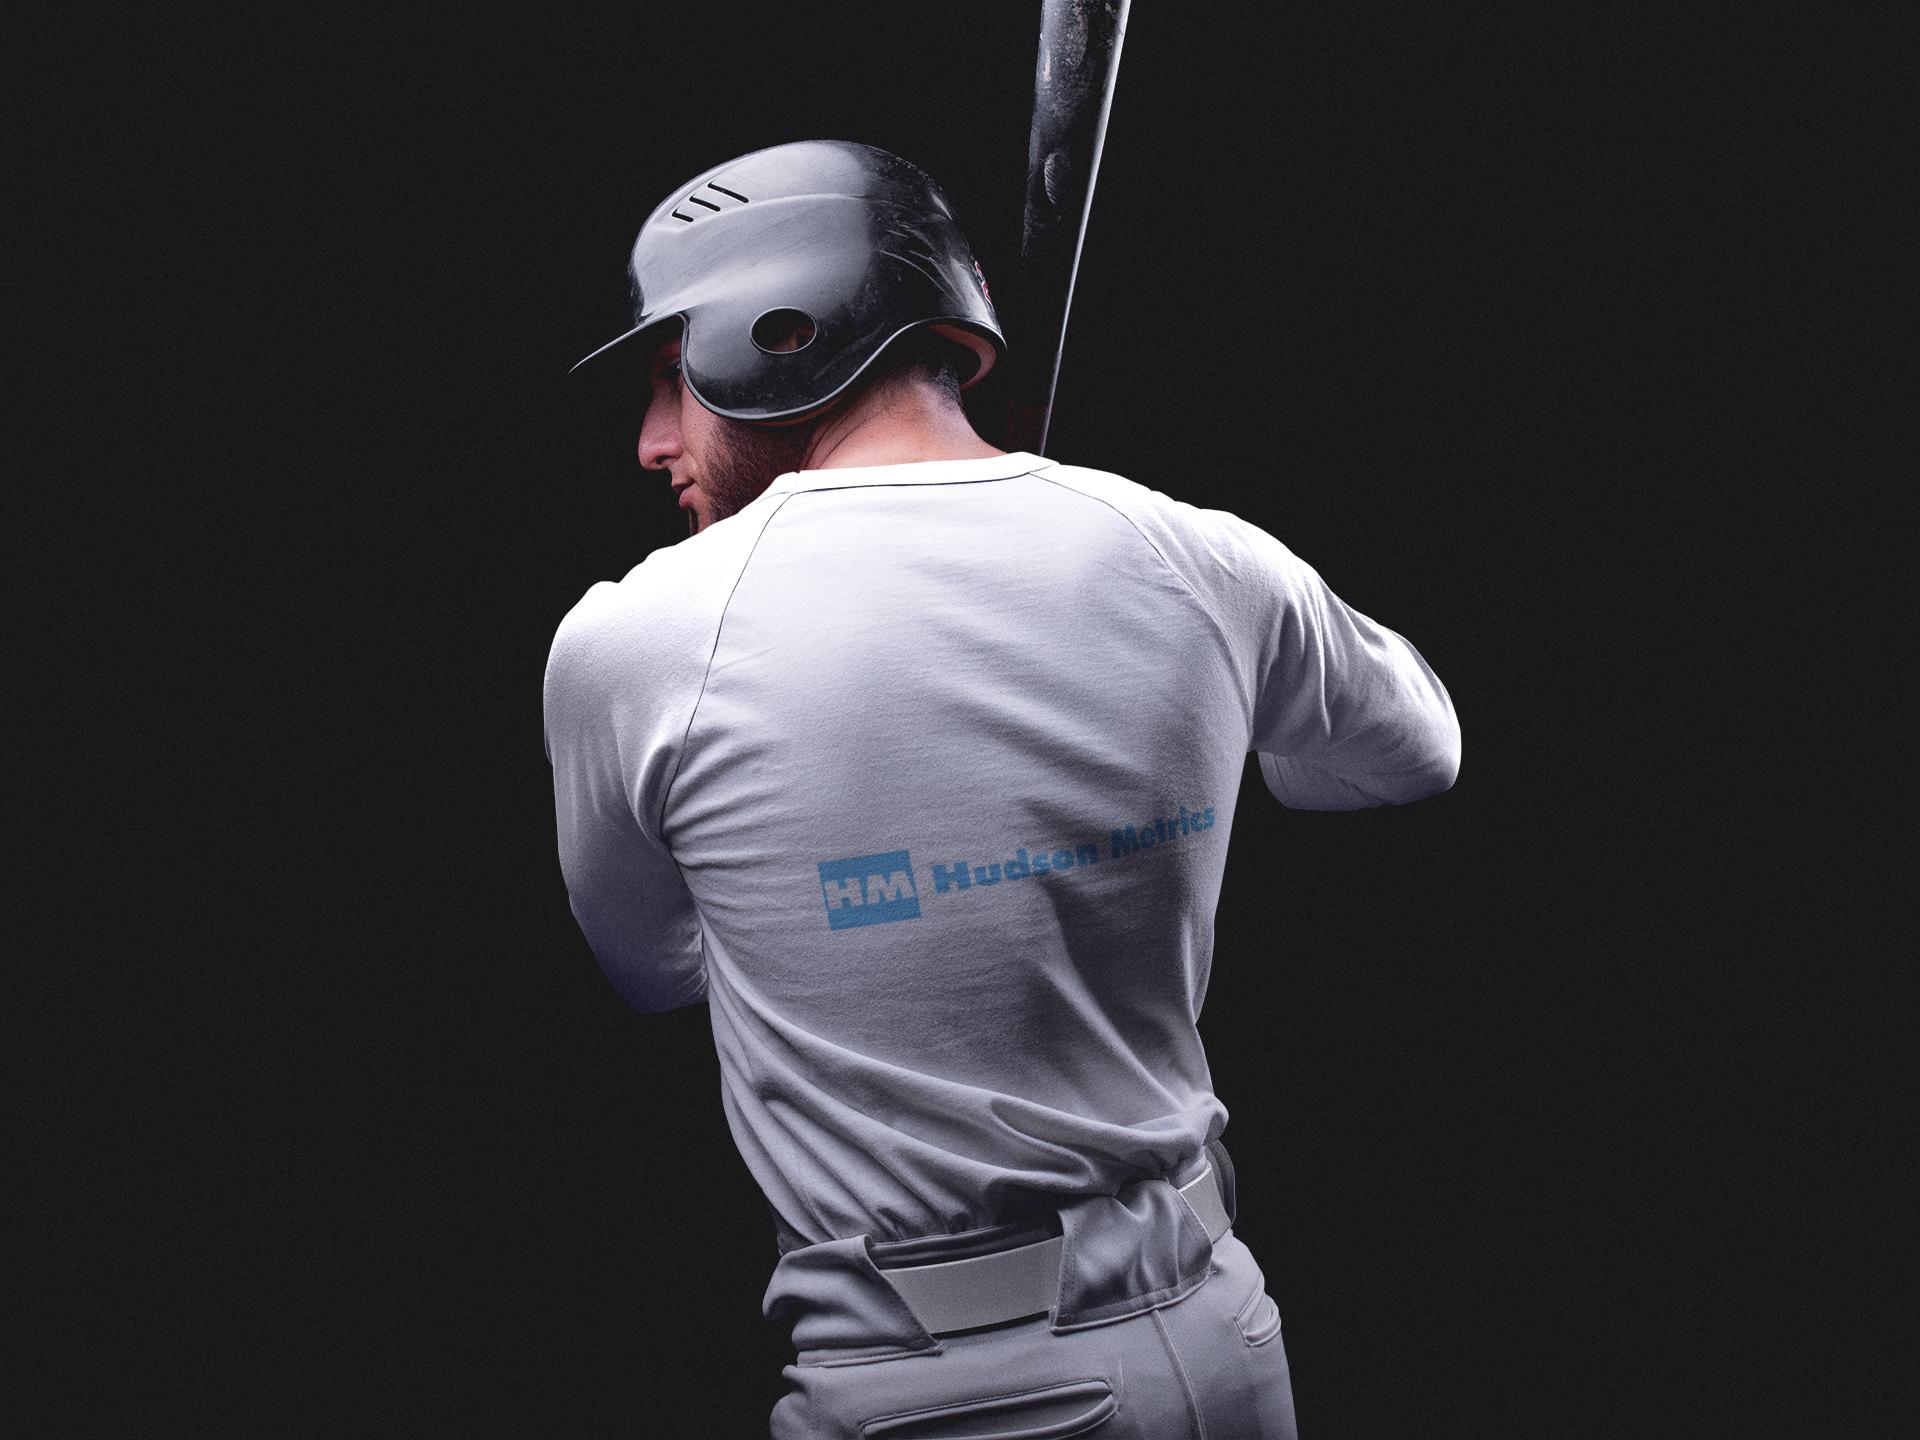 baseball-uniform-designer-back-of-a-man-a15986.png